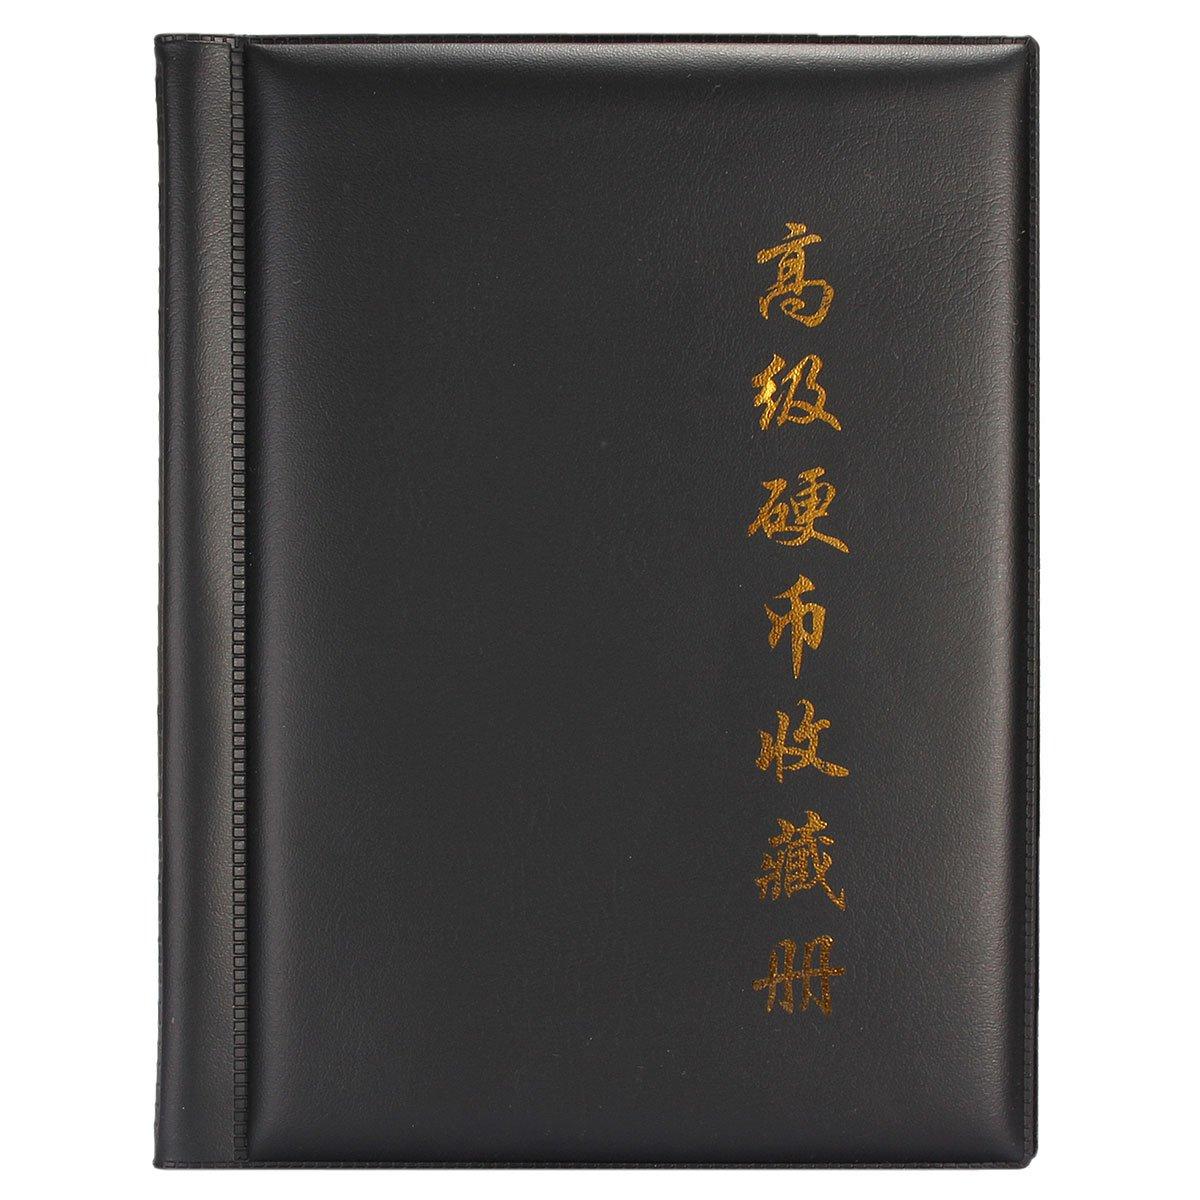 250 Monete Tasche Raccolta Holder Mondo Coin Collection Bagagli Denaro Album Libro -Black Prezzi